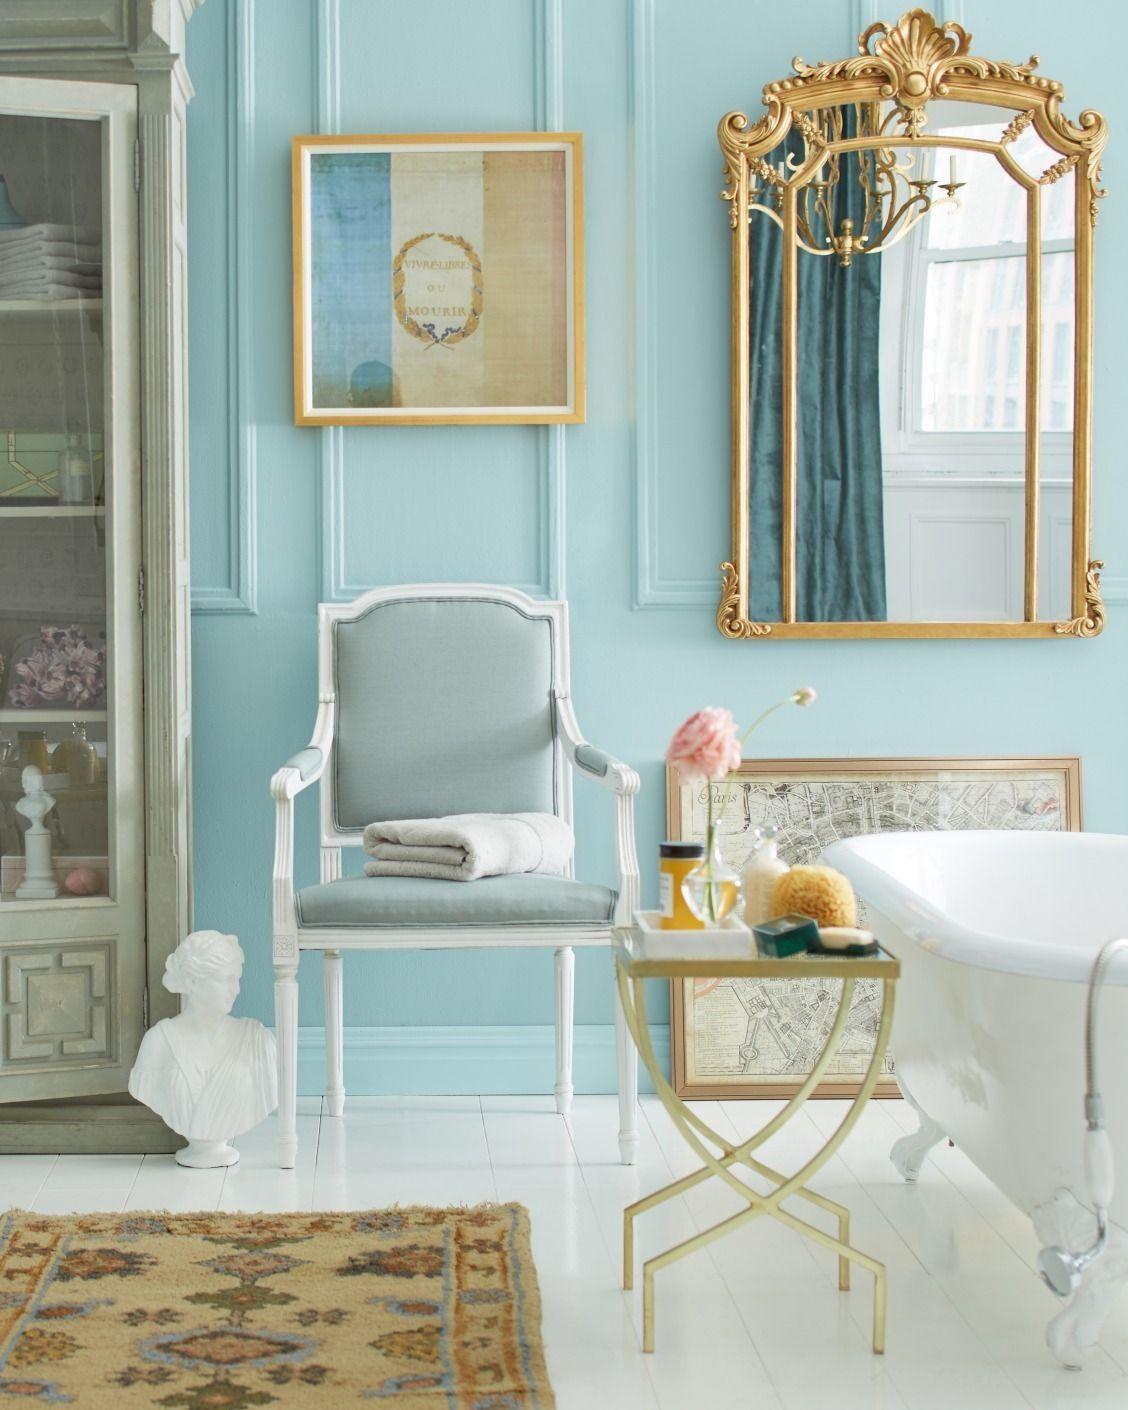 Stunning Parisian-inspired bathroom with light blue walls, bright ...